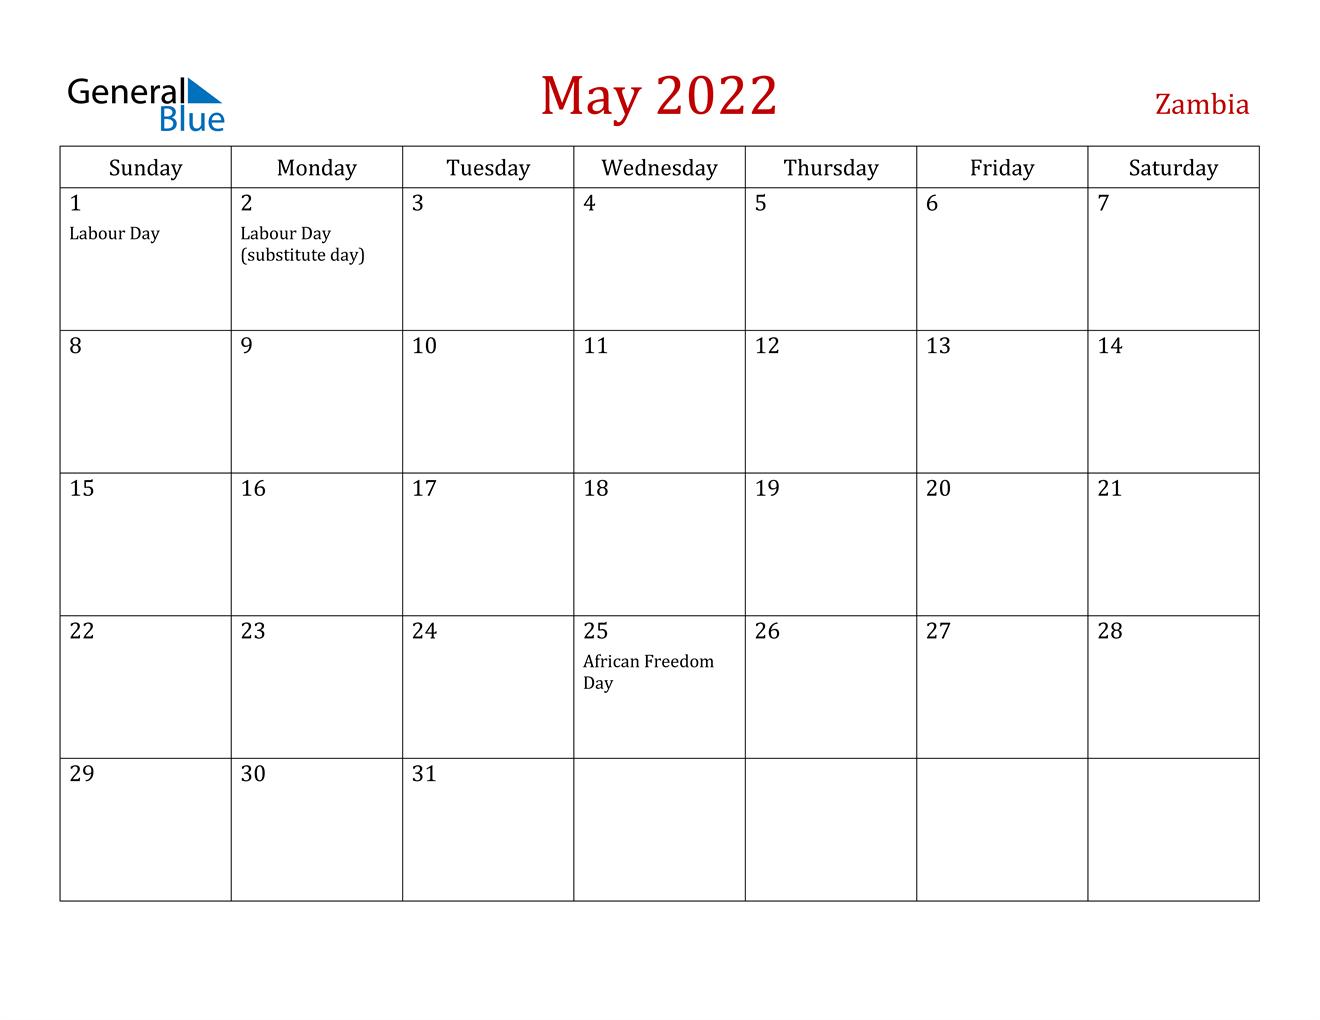 May 2022 Calendar - Zambia